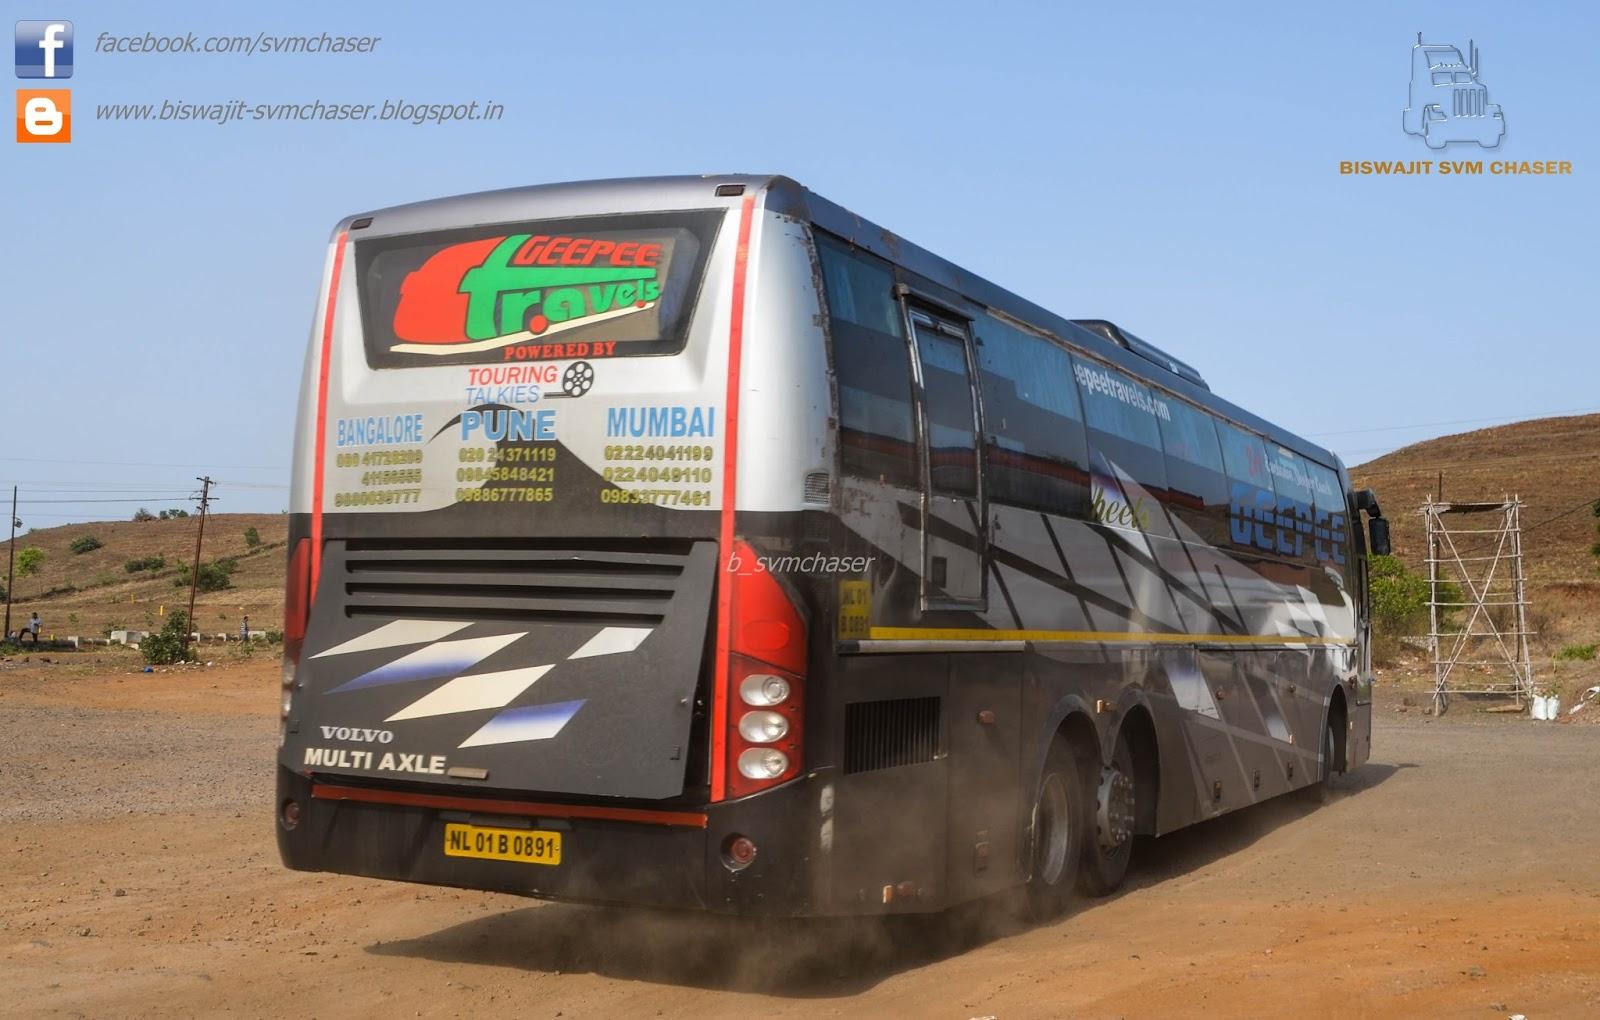 Gee Pee Volvo B9r Multiaxle Sleeper Nl01 B 0891 Biswajit